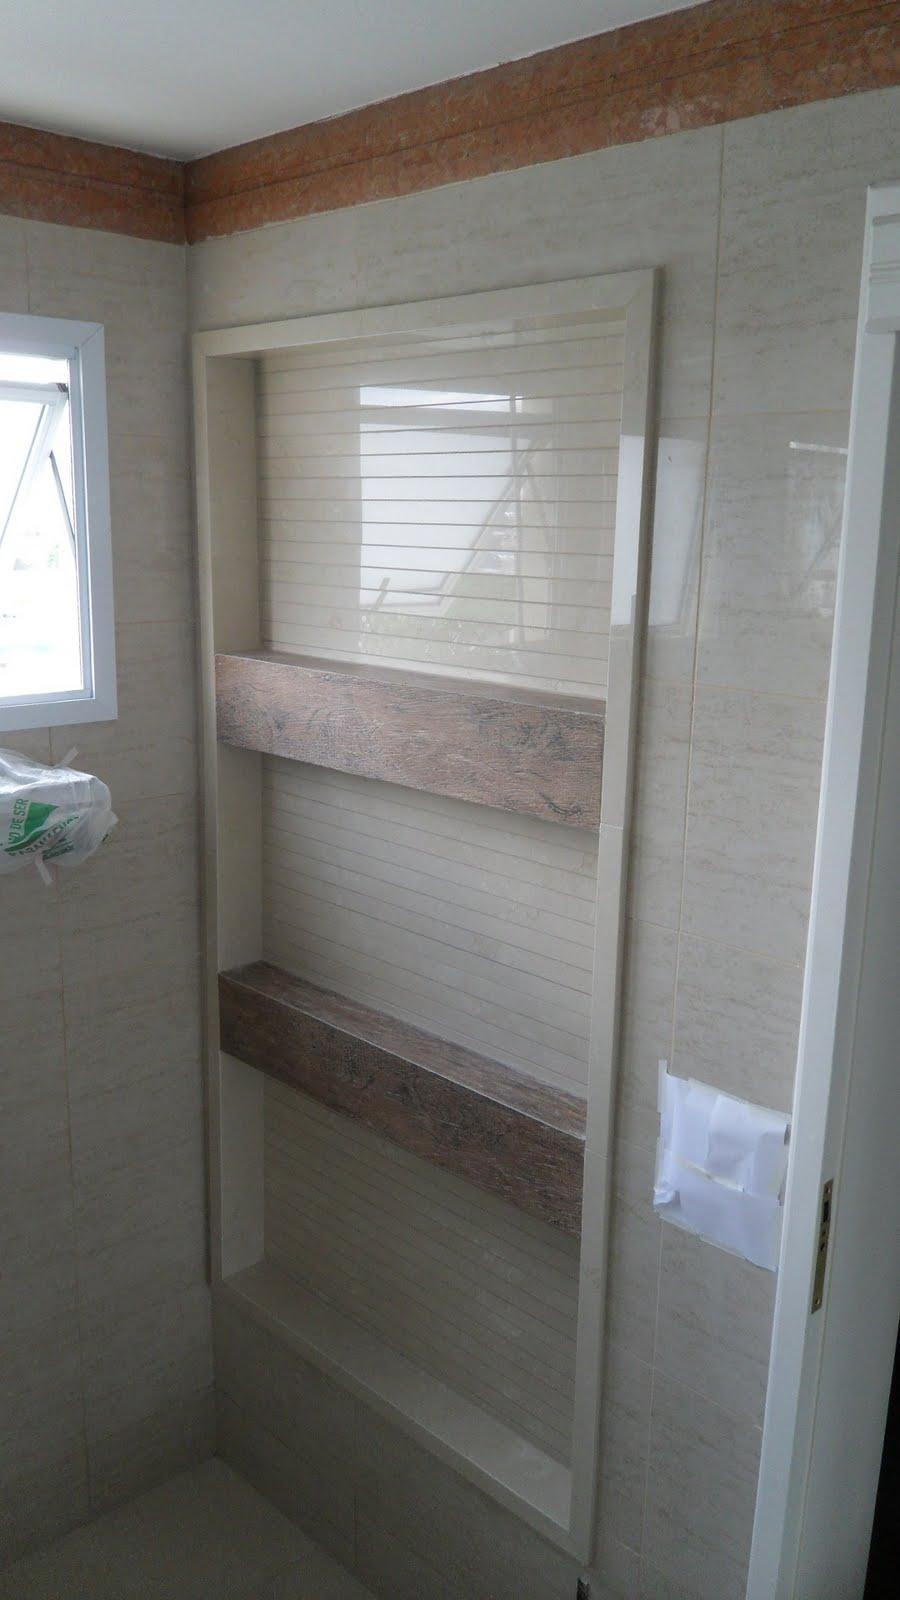 1000+ images about Banheiro  Bathroom on Pinterest  Arquitetura, Cuba and B -> Nicho Para Shampoo Banheiro